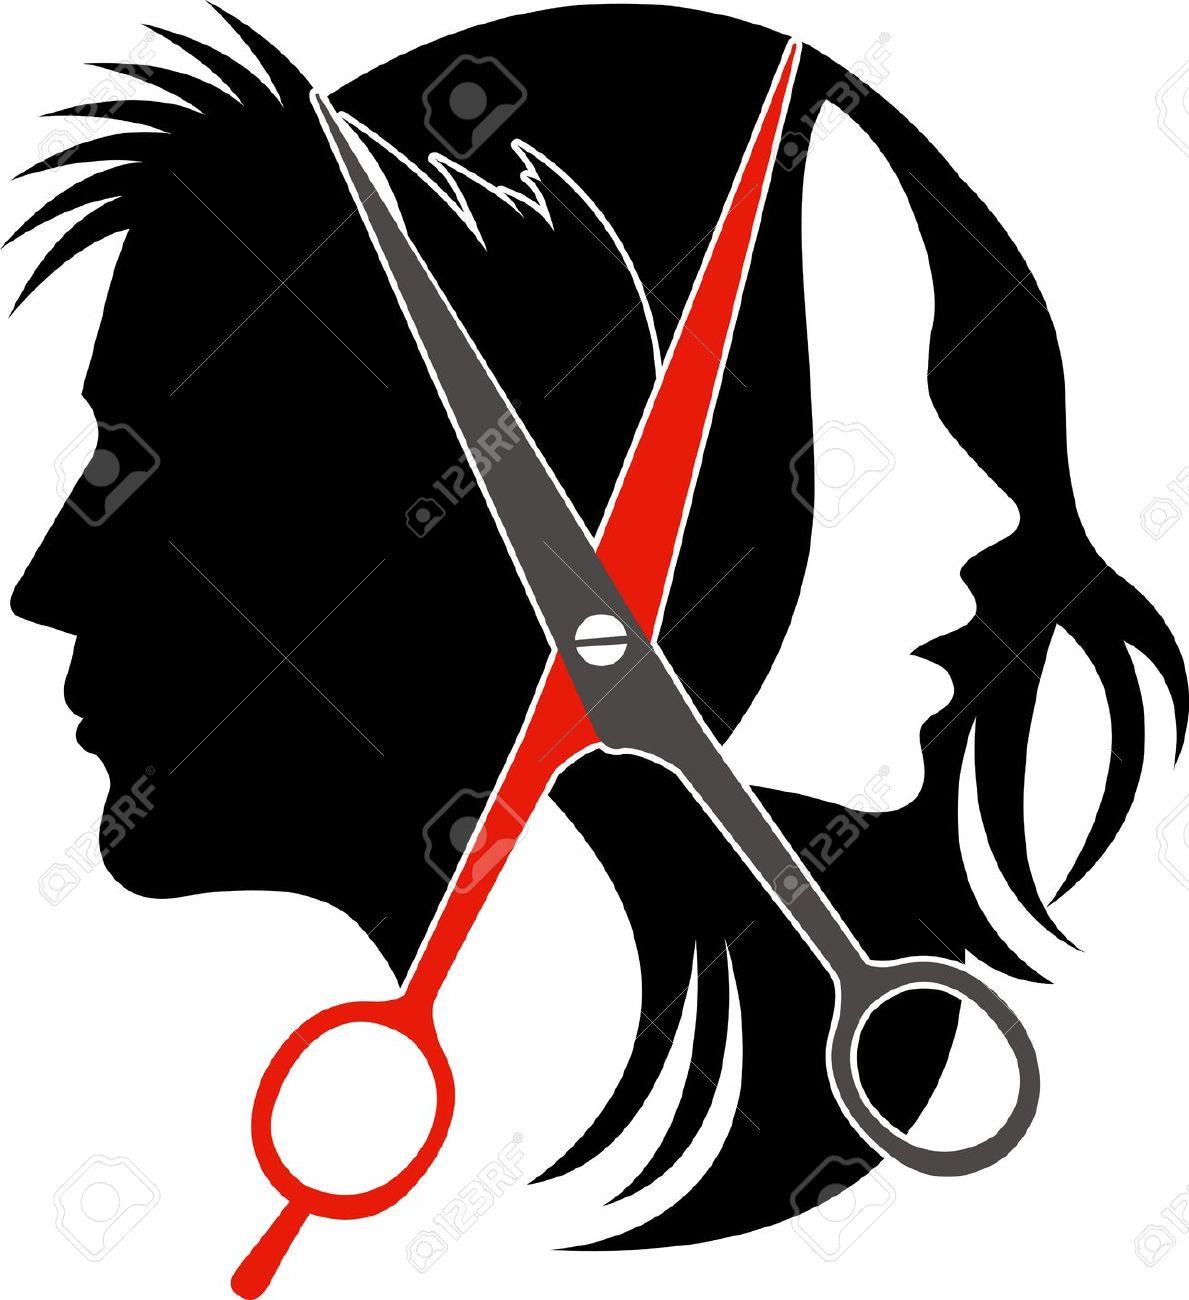 hair salon: Illustration art of salon co-hair salon: Illustration art of salon concept on isolated background  Illustration-11